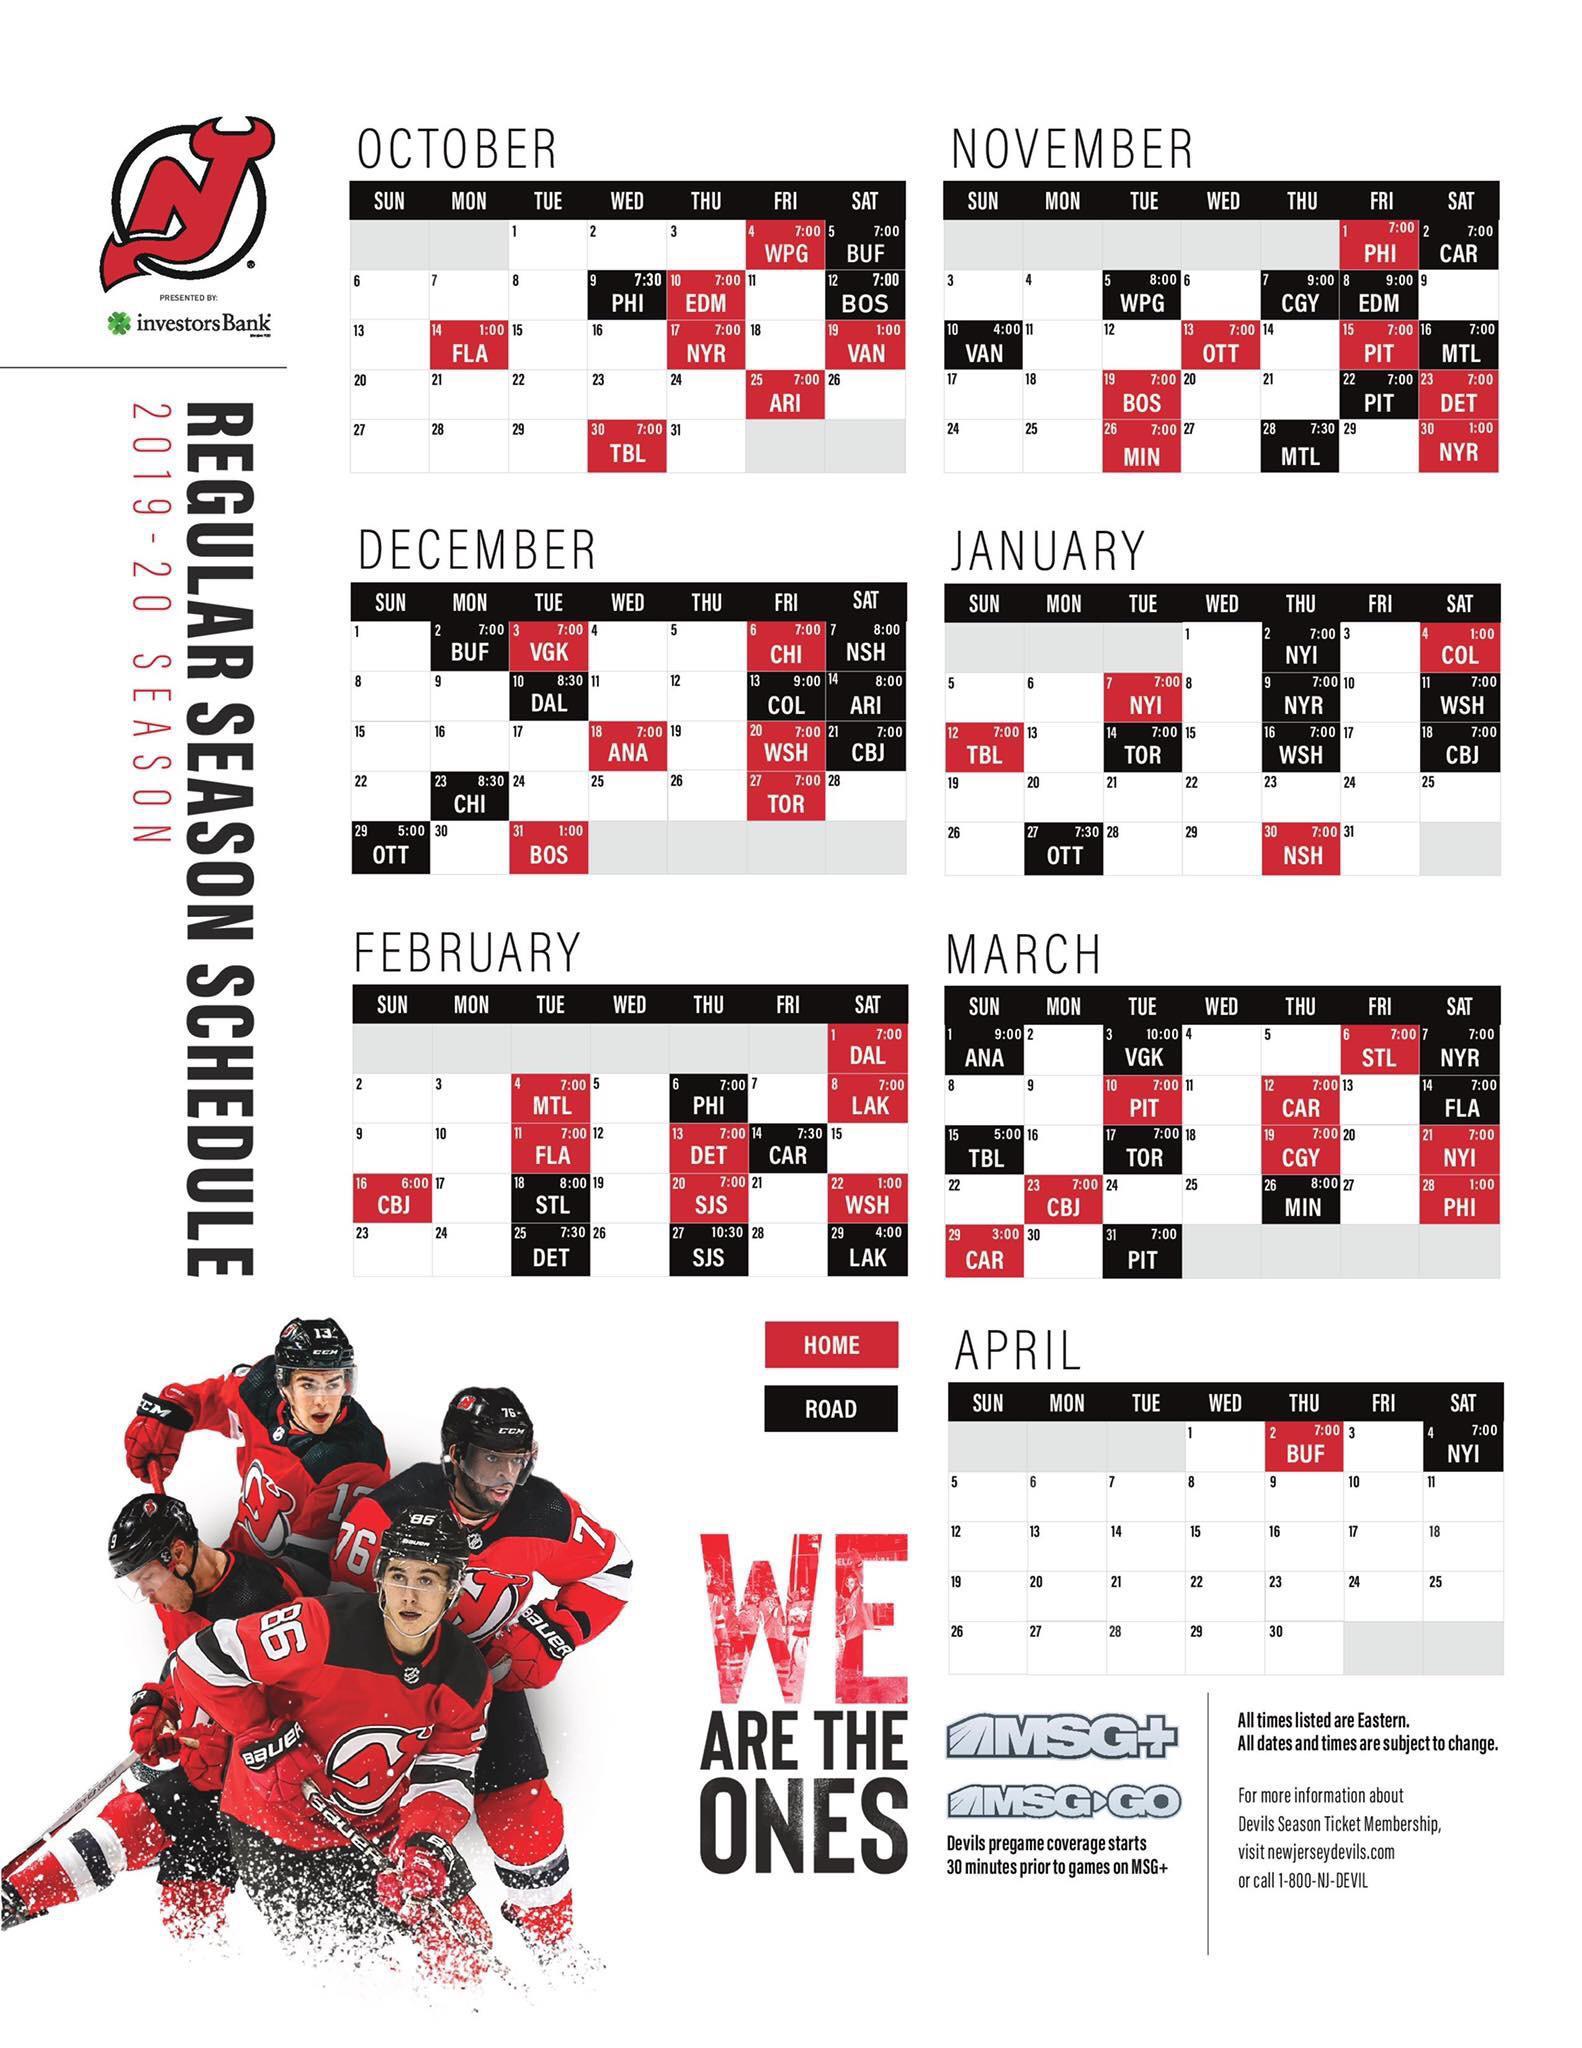 Devils 2019 20 Schedule Released Devils